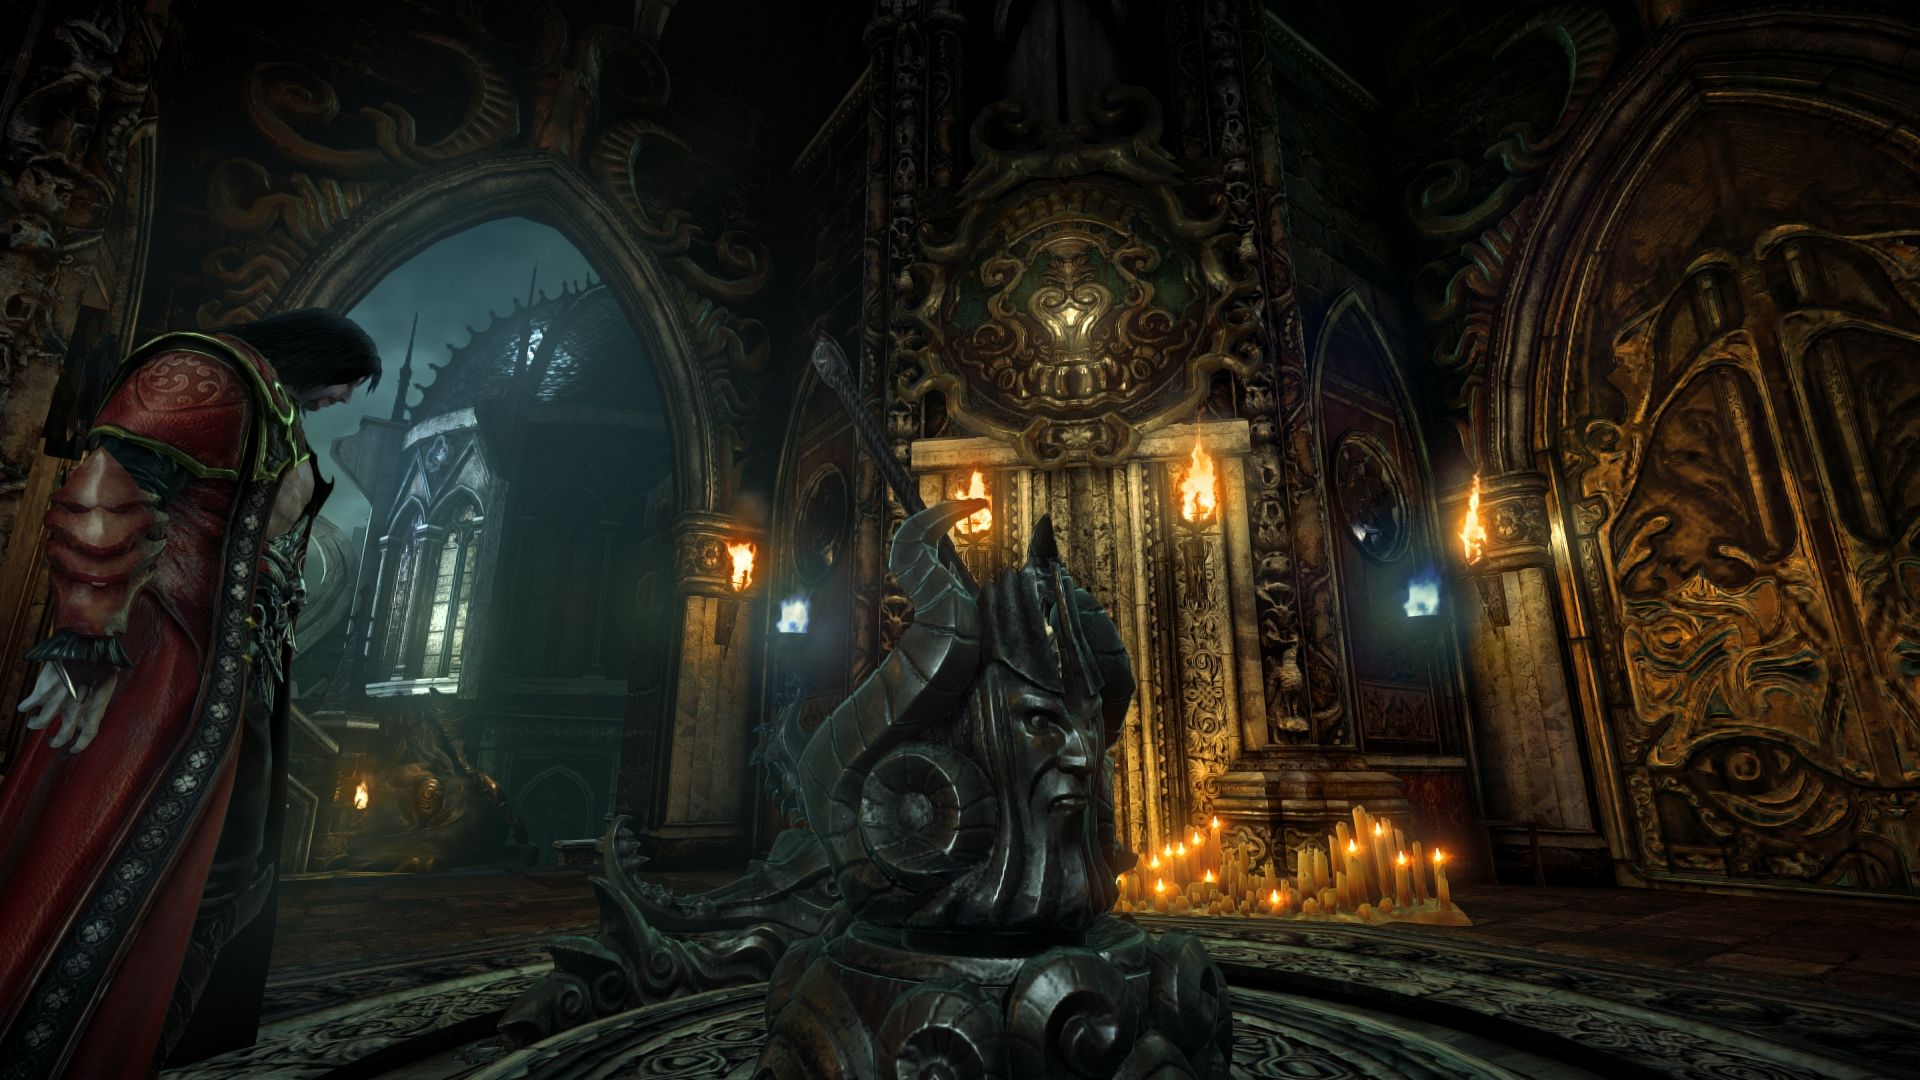 Screenshoty z Castlevania: Lords of Shadow 2 84891